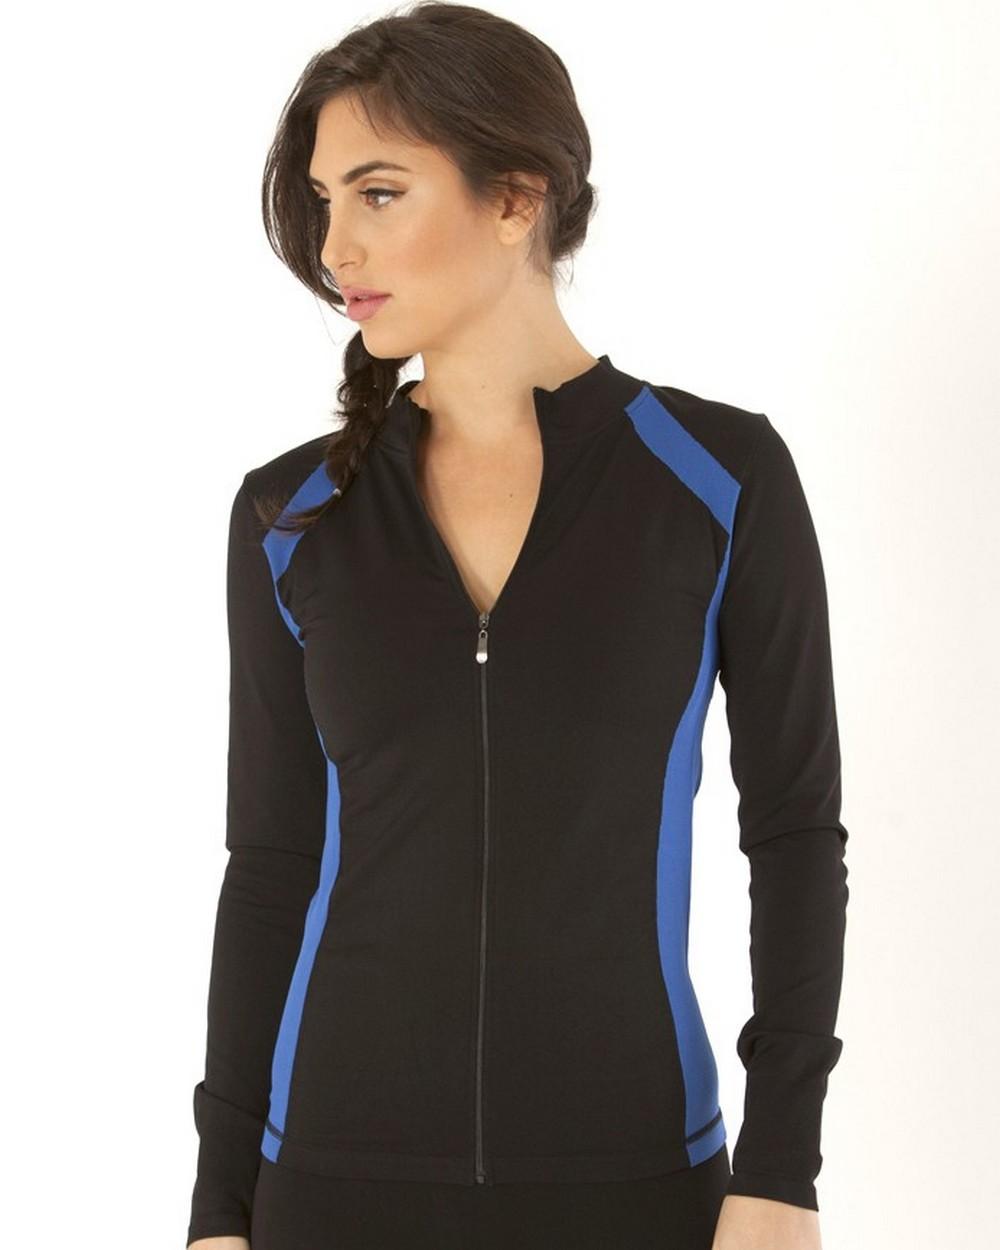 Electric Yoga Jacket with Stitching Royal Blue